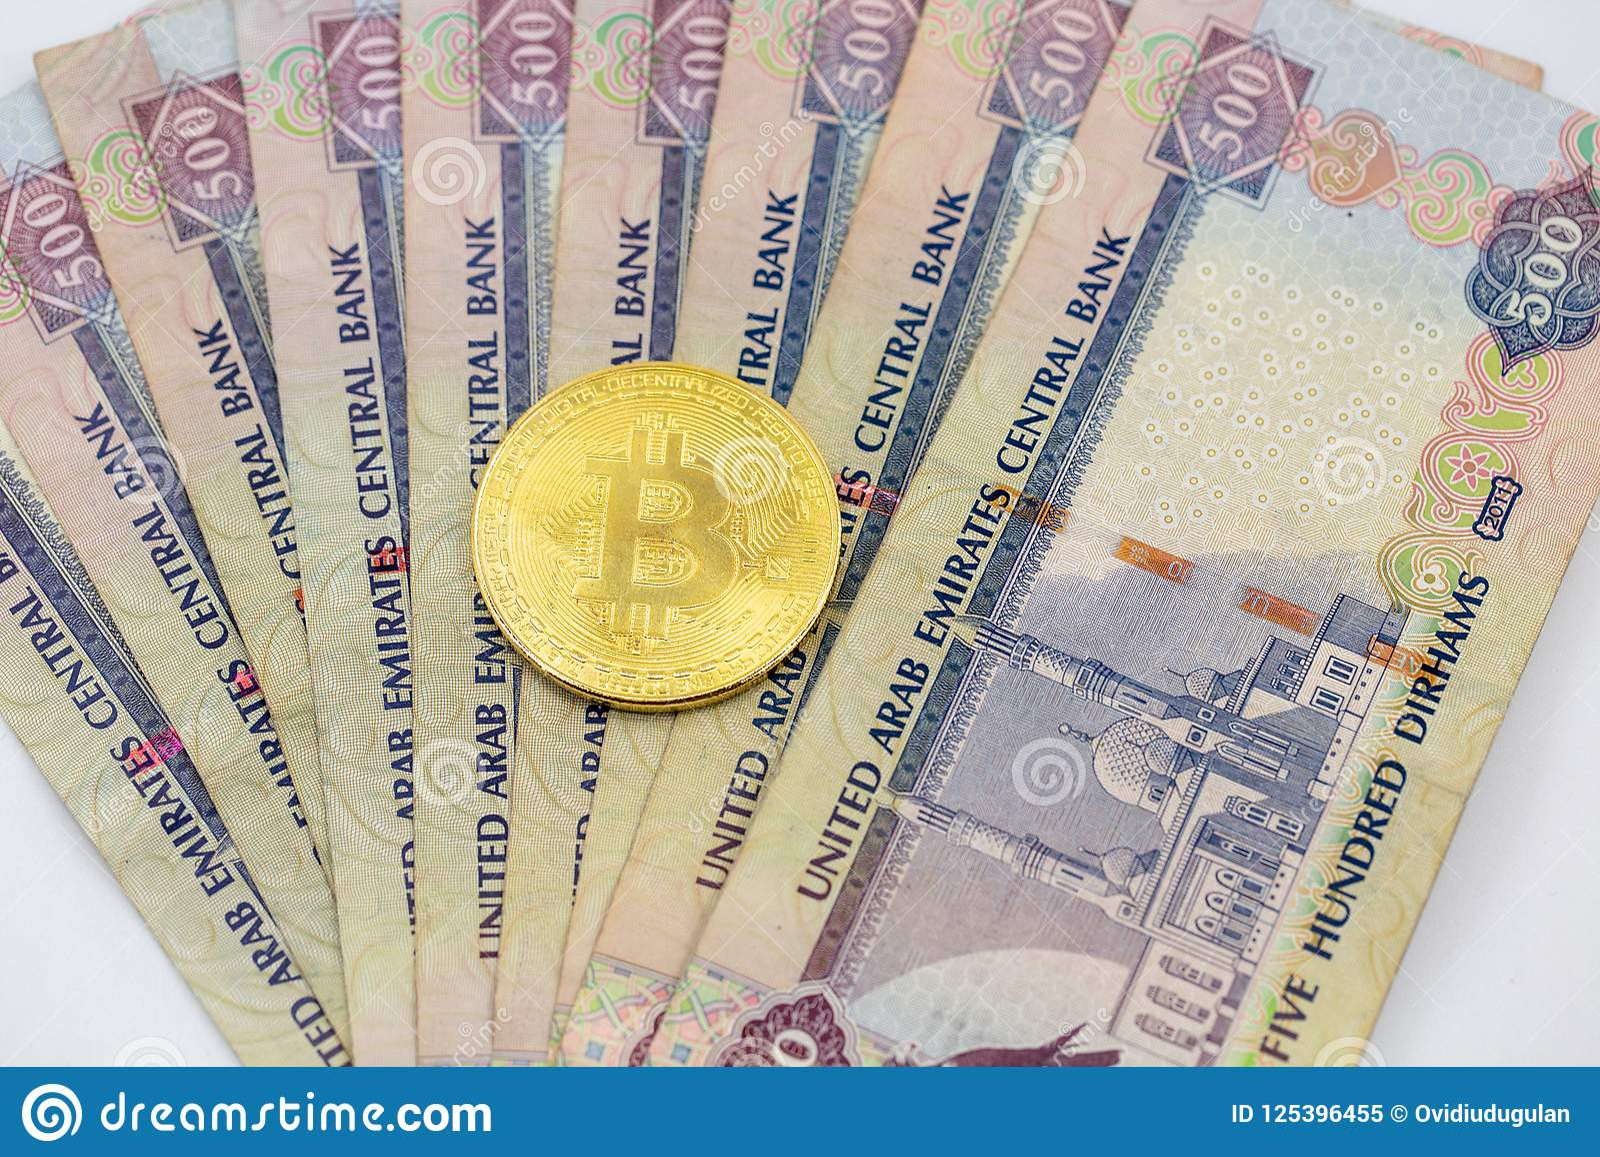 bitcoin di dirham btc al grafico cad